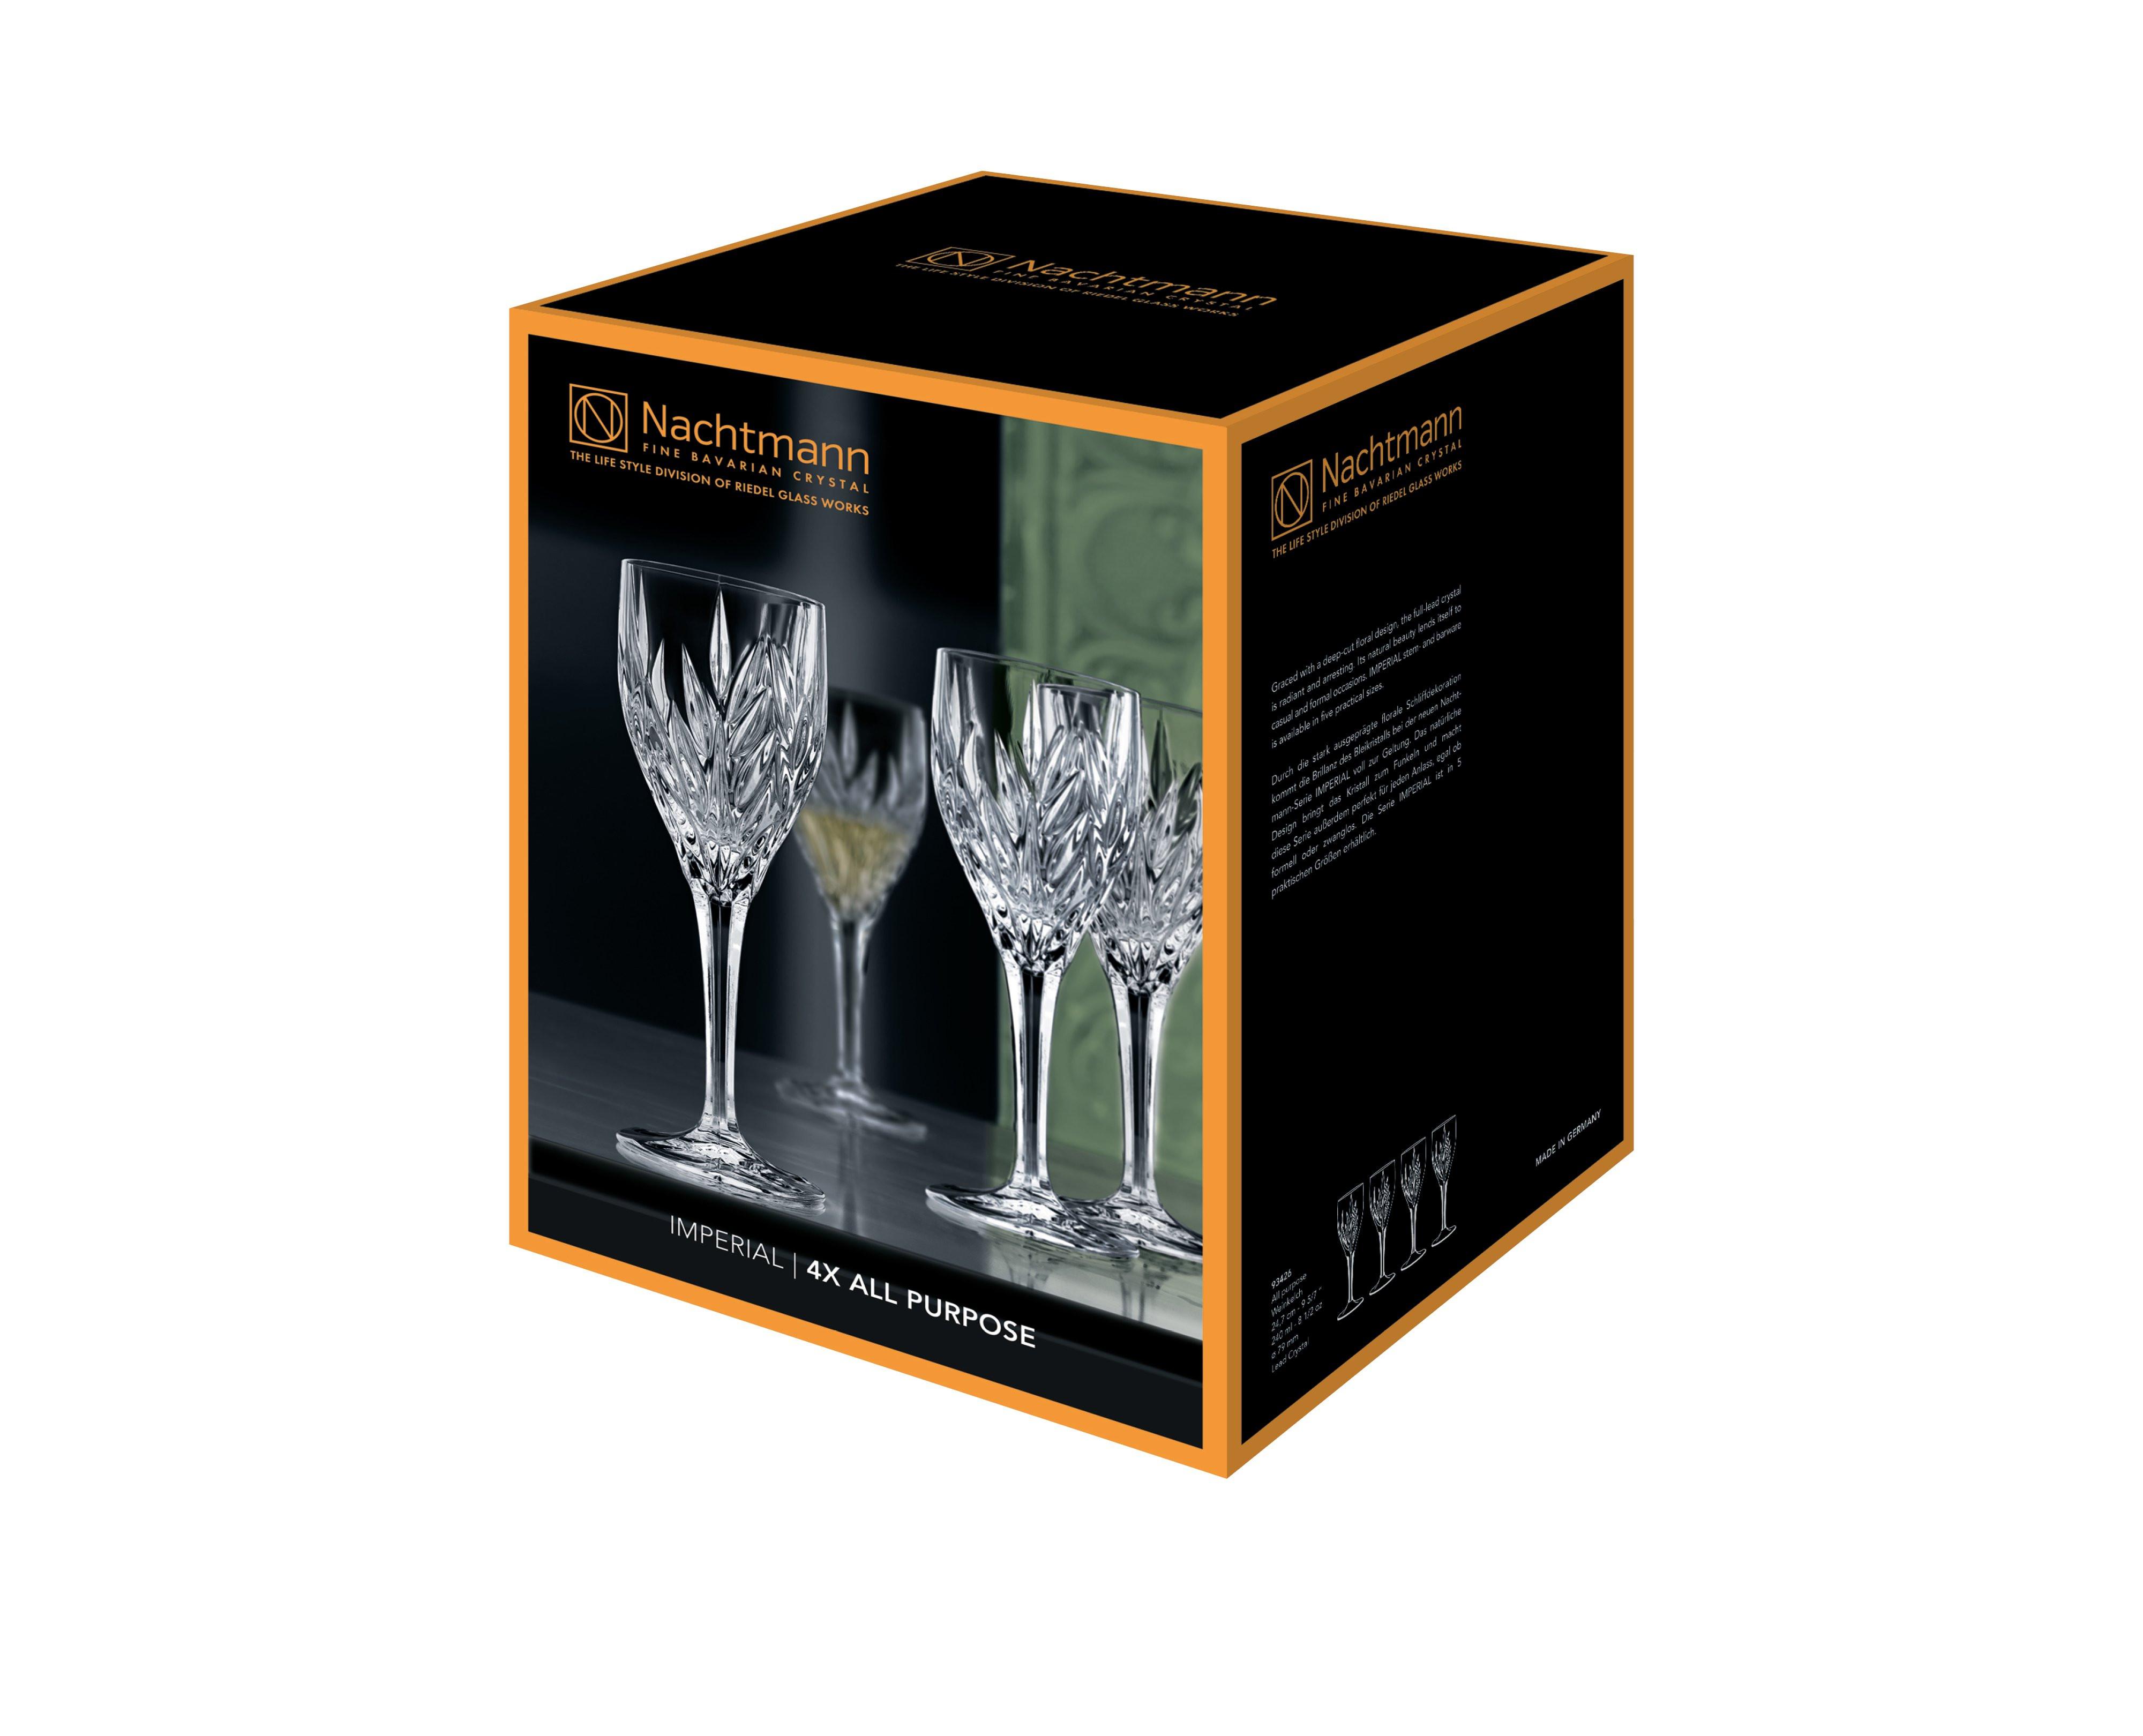 nachtmann art deco vase of nachtmann imperial all purpose regarding 93426 packaging 5julqqtb